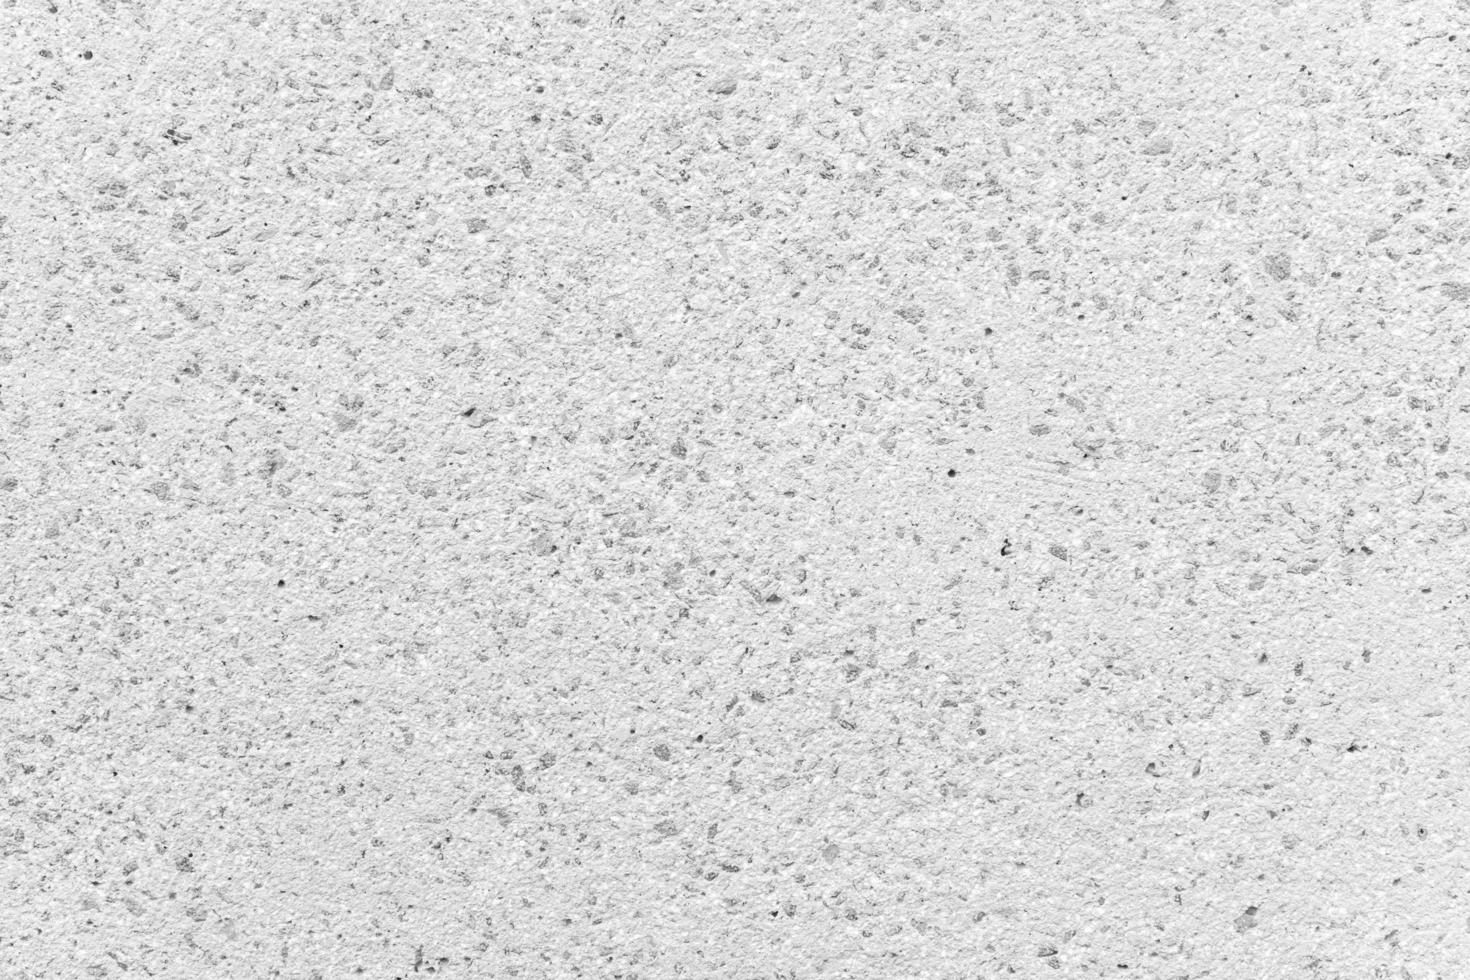 lichtgrijs betonnen oppervlak foto